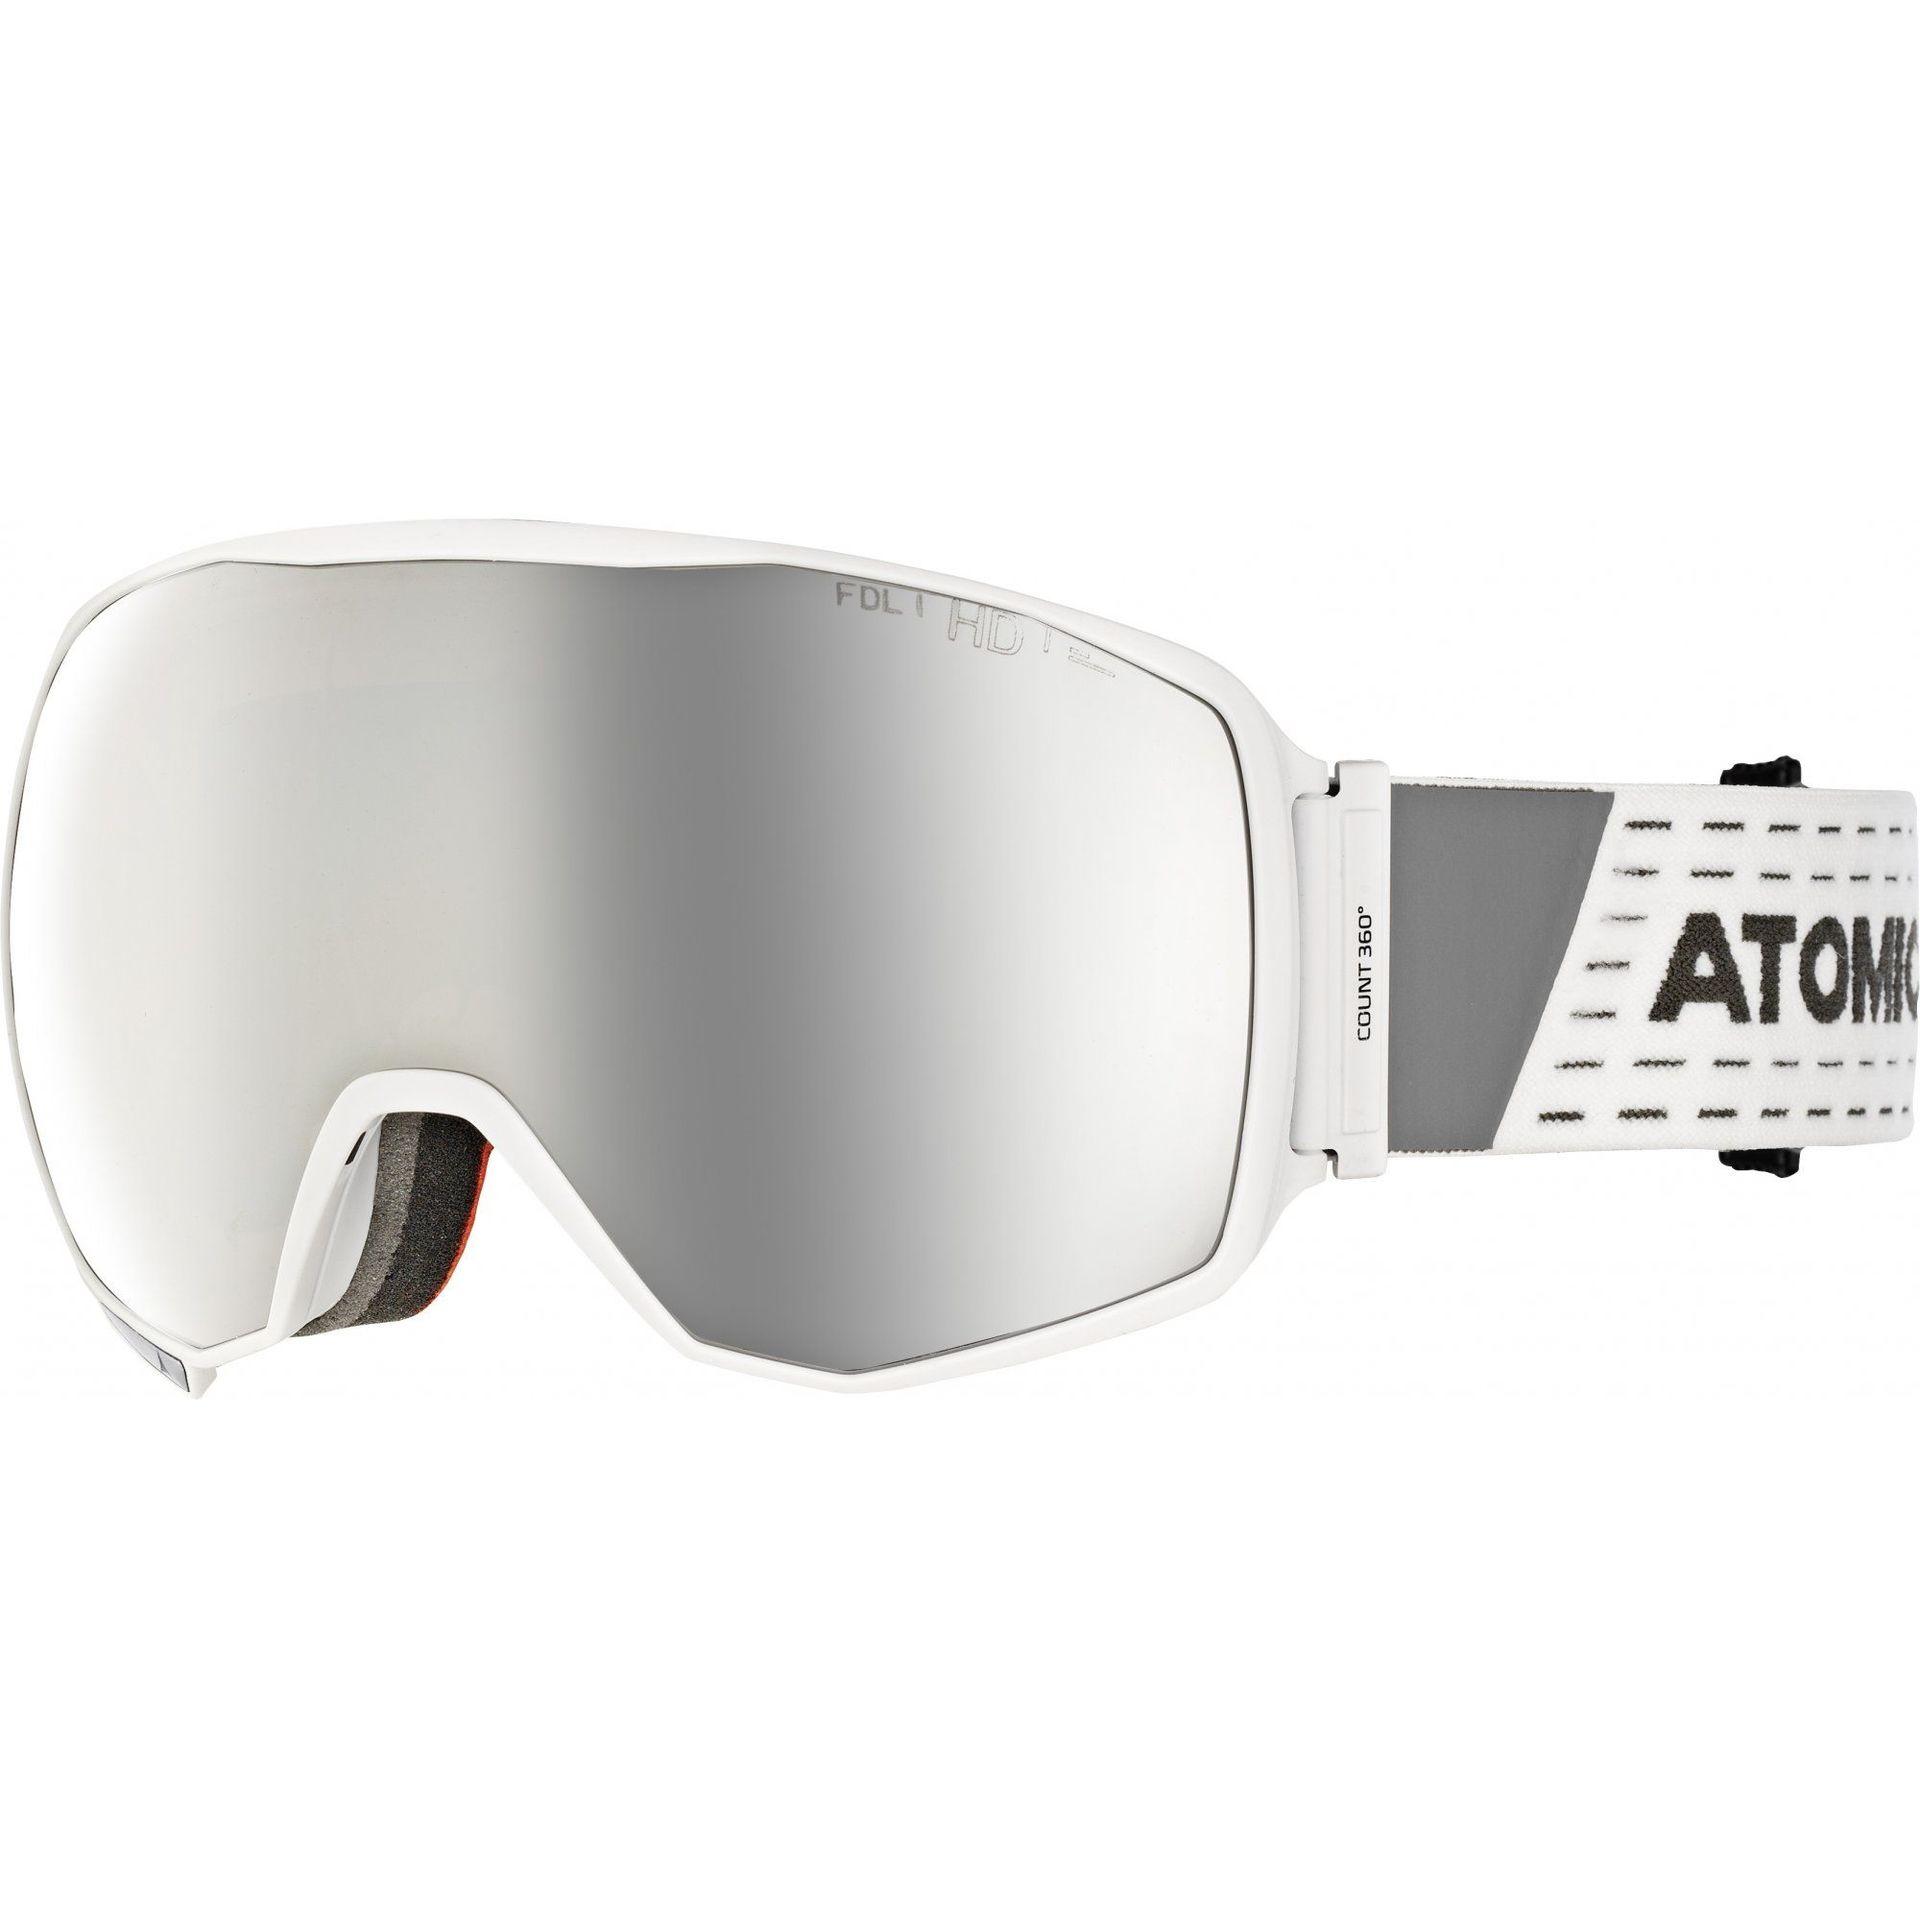 GOGLE ATOMIC COUNT 360° HD WHITE SILVER HD AN5105618